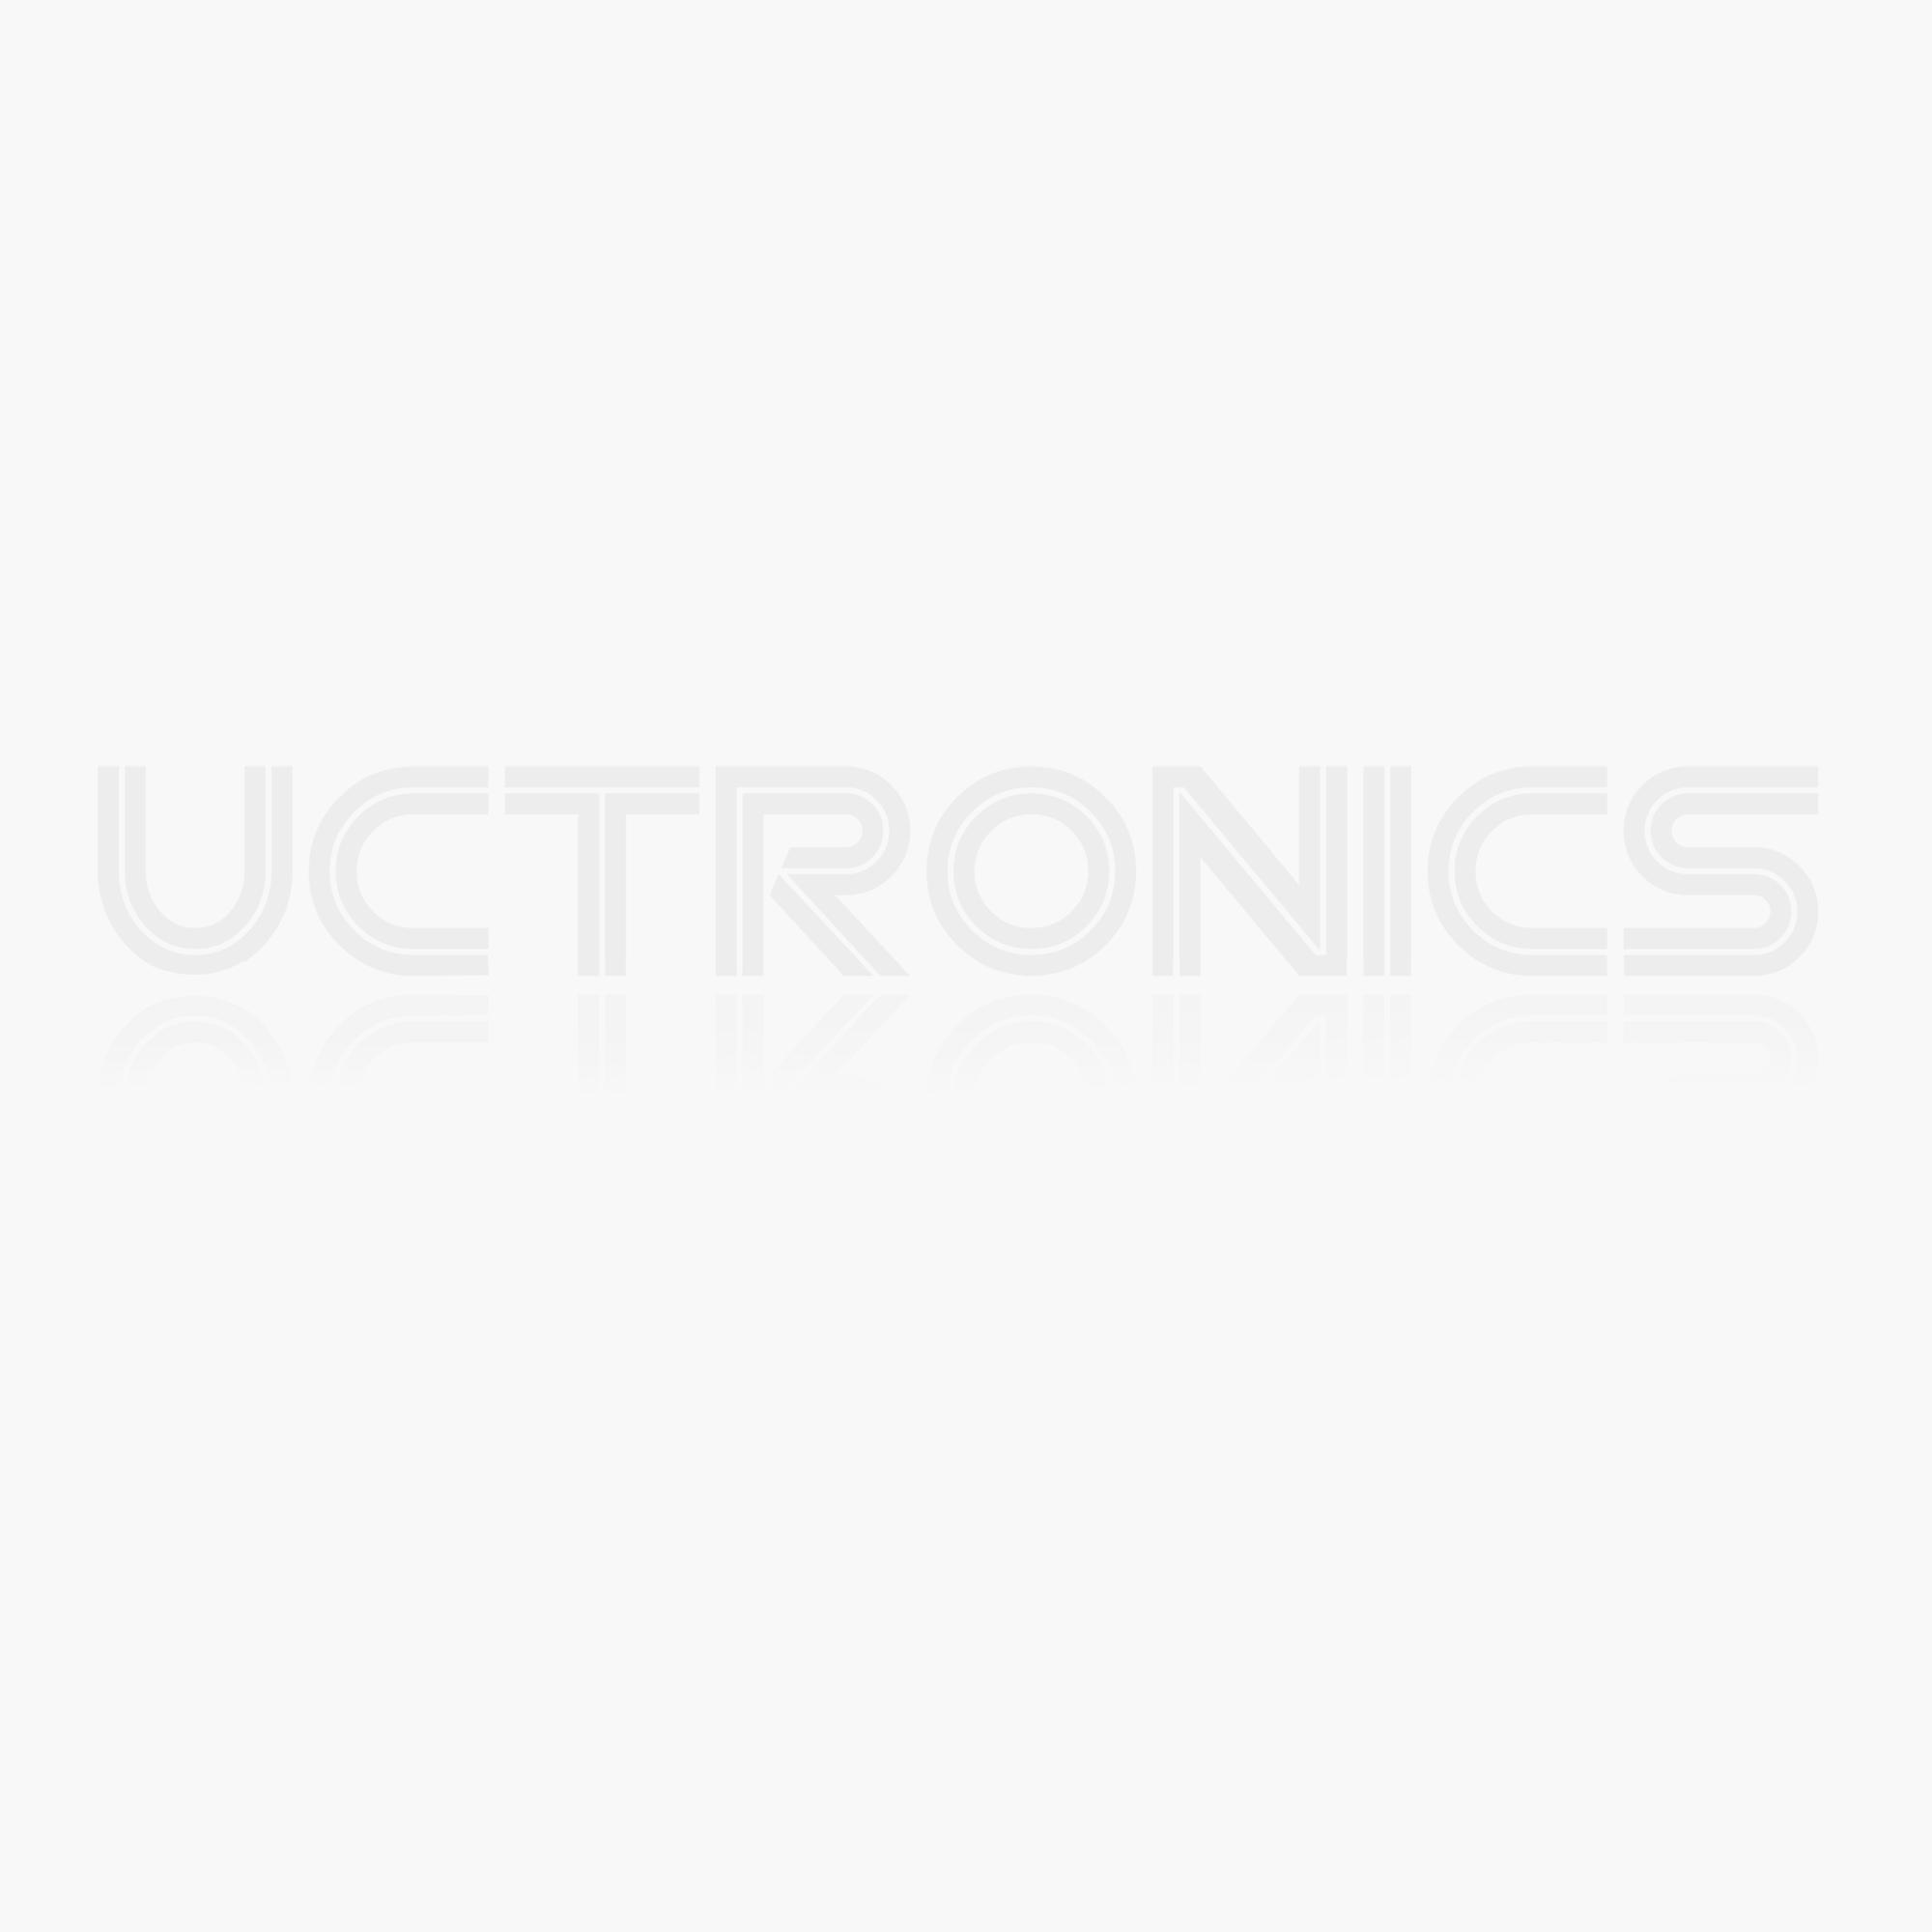 10-15V to 0.9-12V DC-DC Buck Step-Down Voltage Power Supply Module